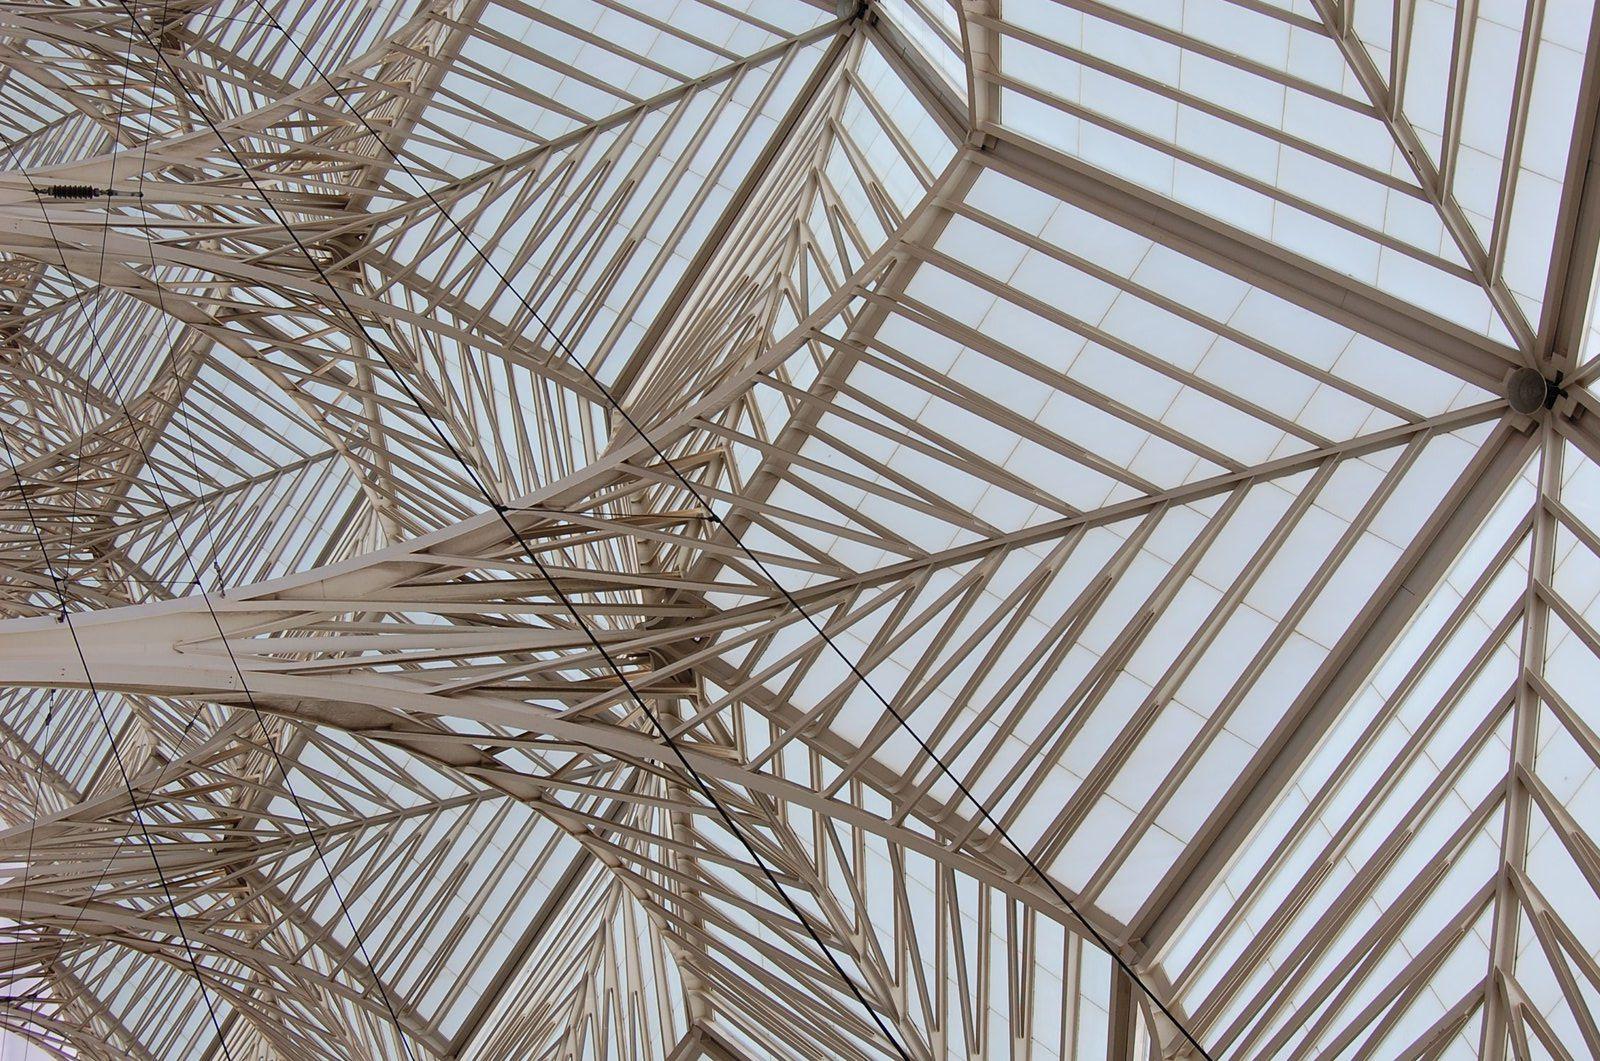 Santiago Calatrava - Gare d' Oriente Lisbonne - Photos: Lankaart (c)